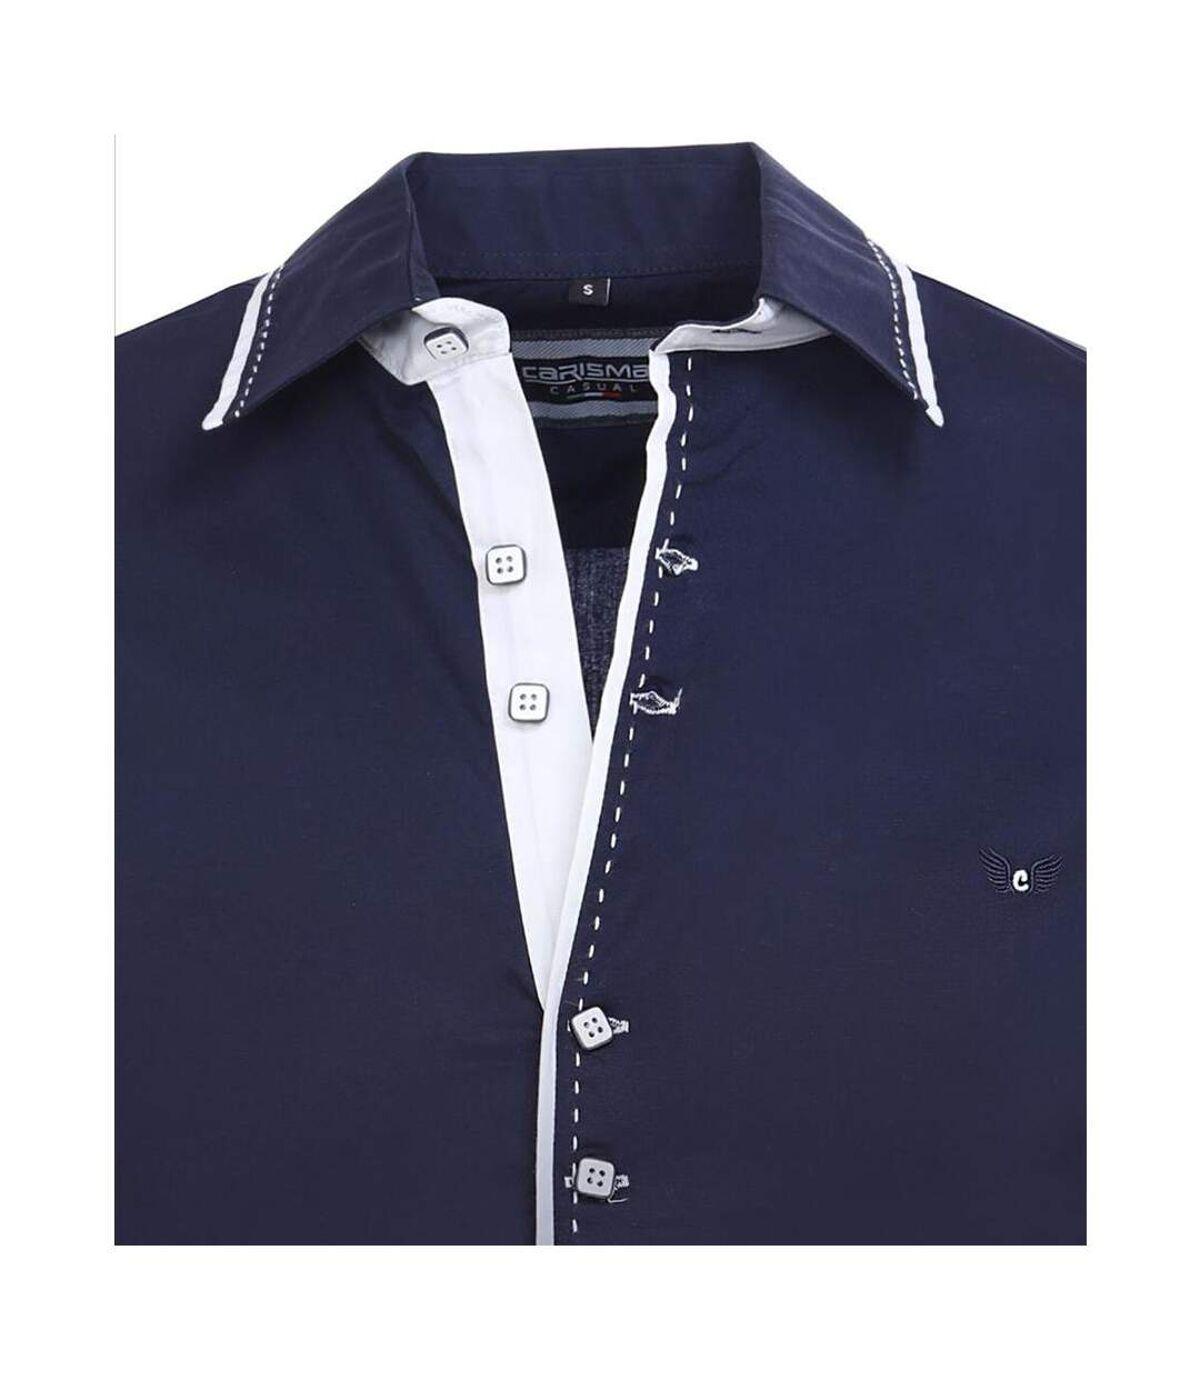 Chemise homme tendance Chemise 8245 bleu marine